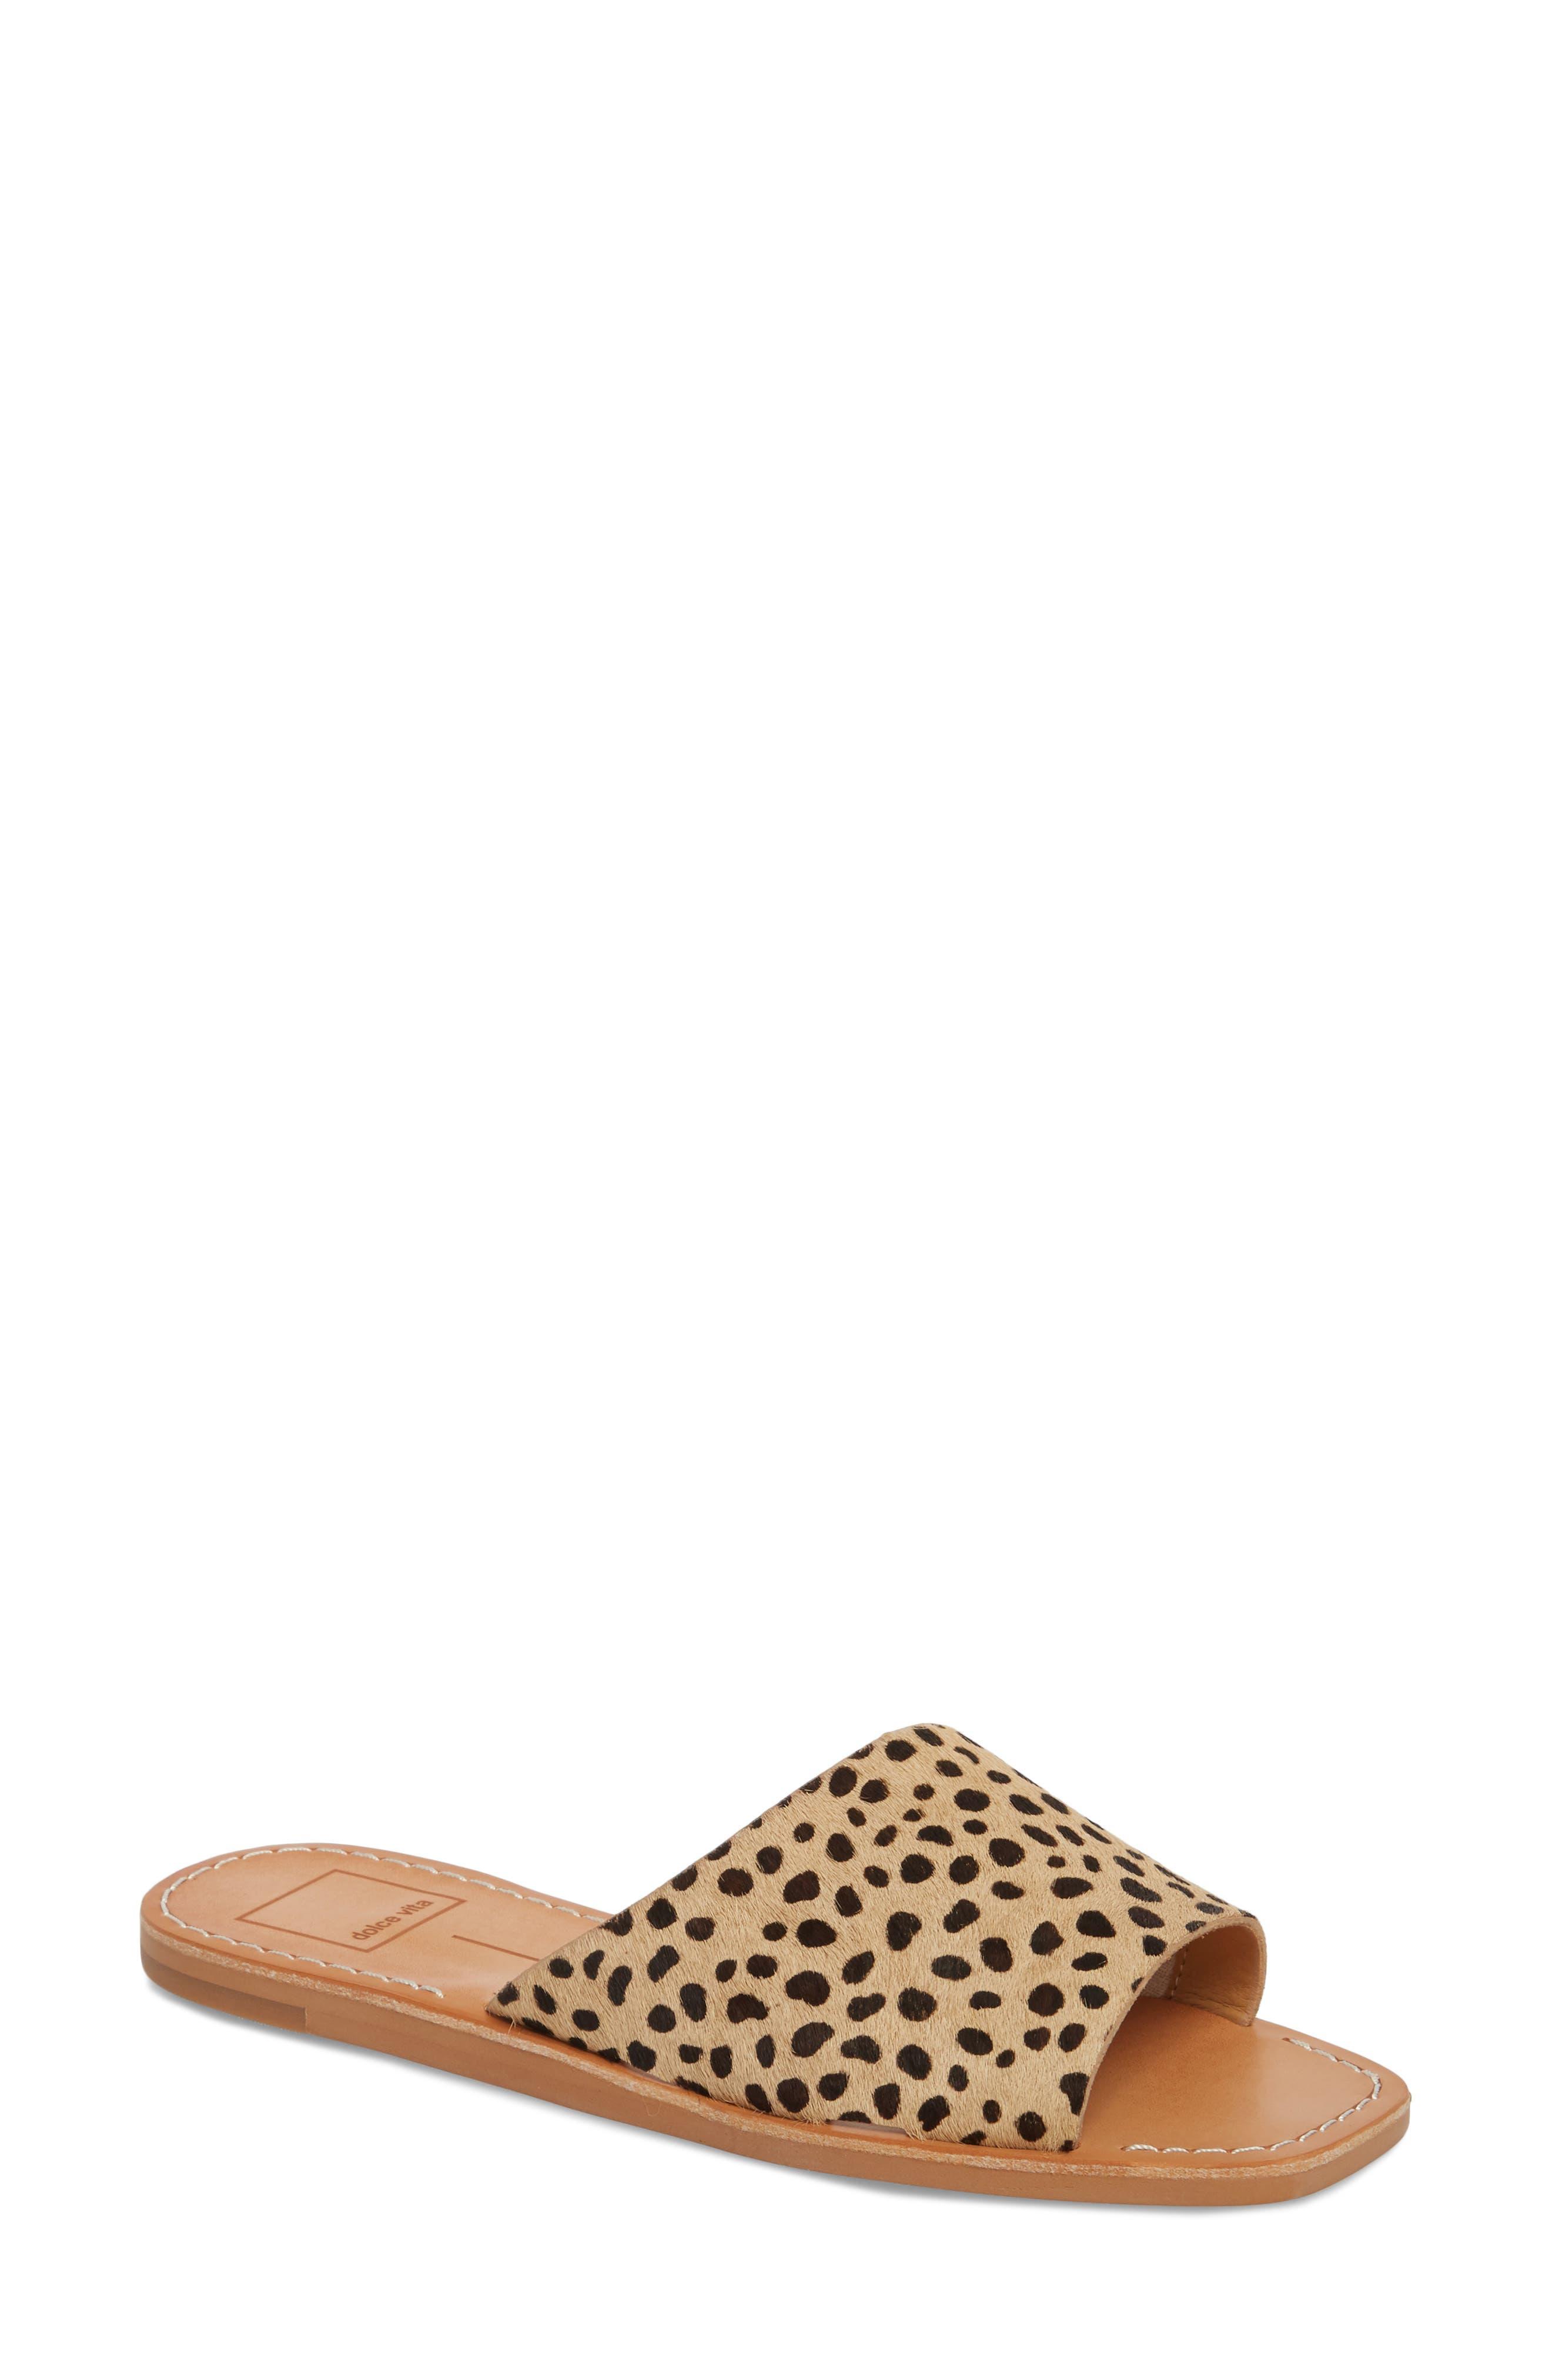 Cato Genuine Calf Hair Slide Sandal,                             Main thumbnail 3, color,